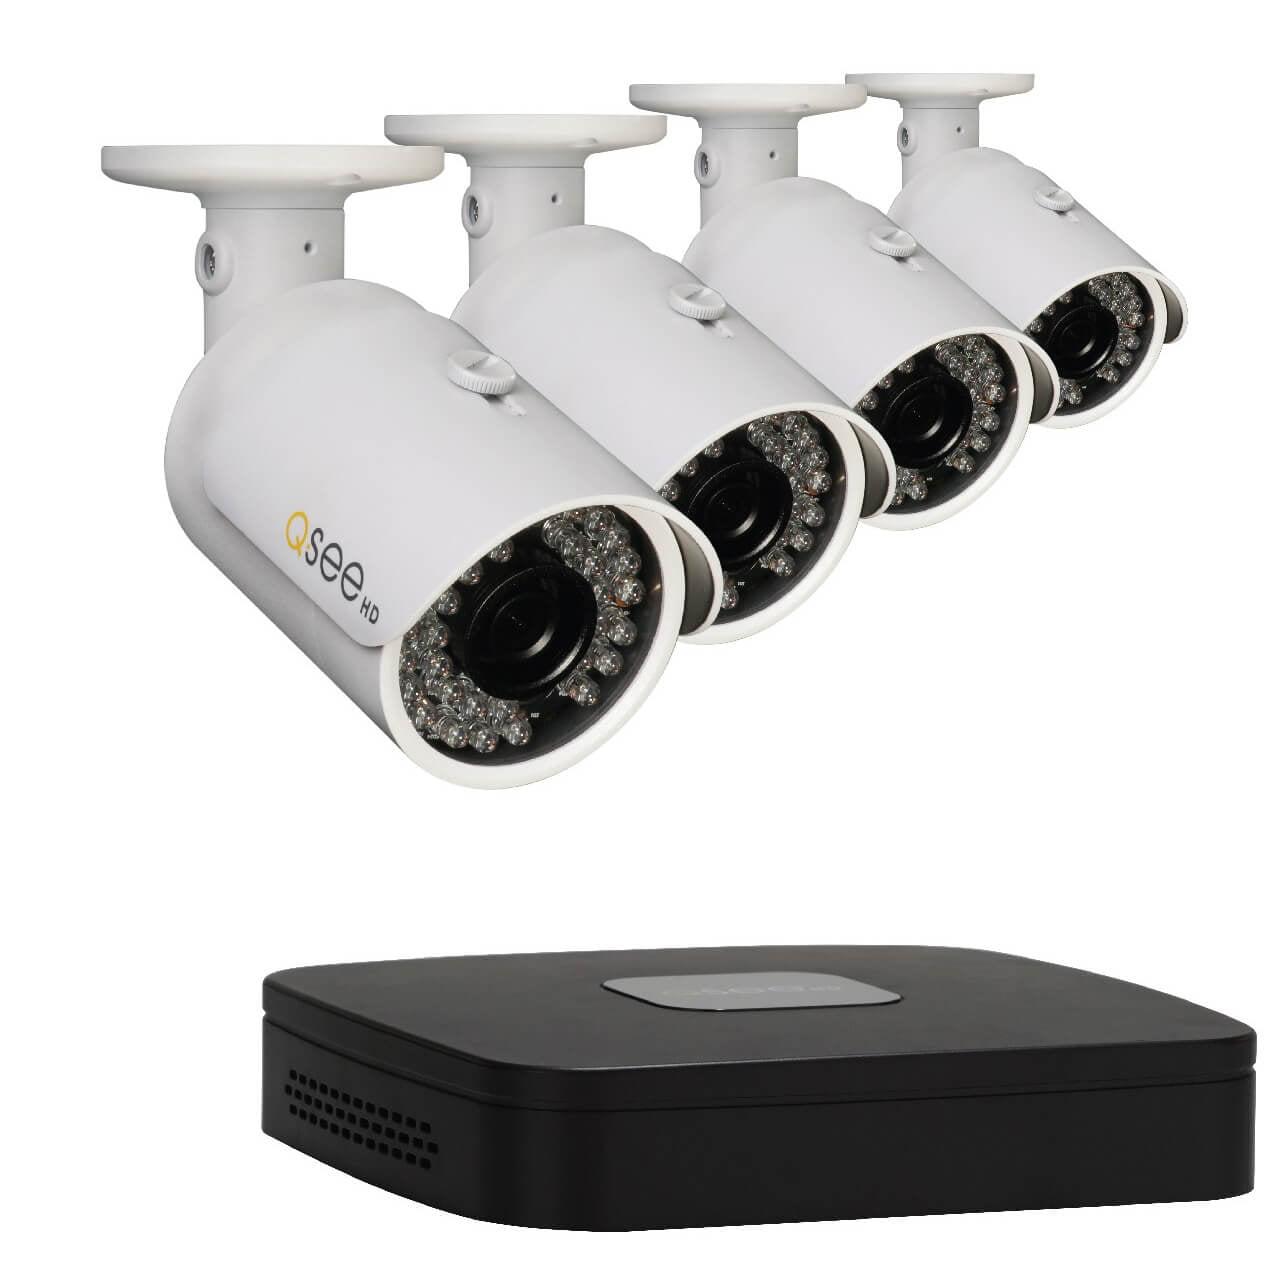 Q-See QC918-4Y6-1R 8-Channel Network DVR Surveillance Kit...